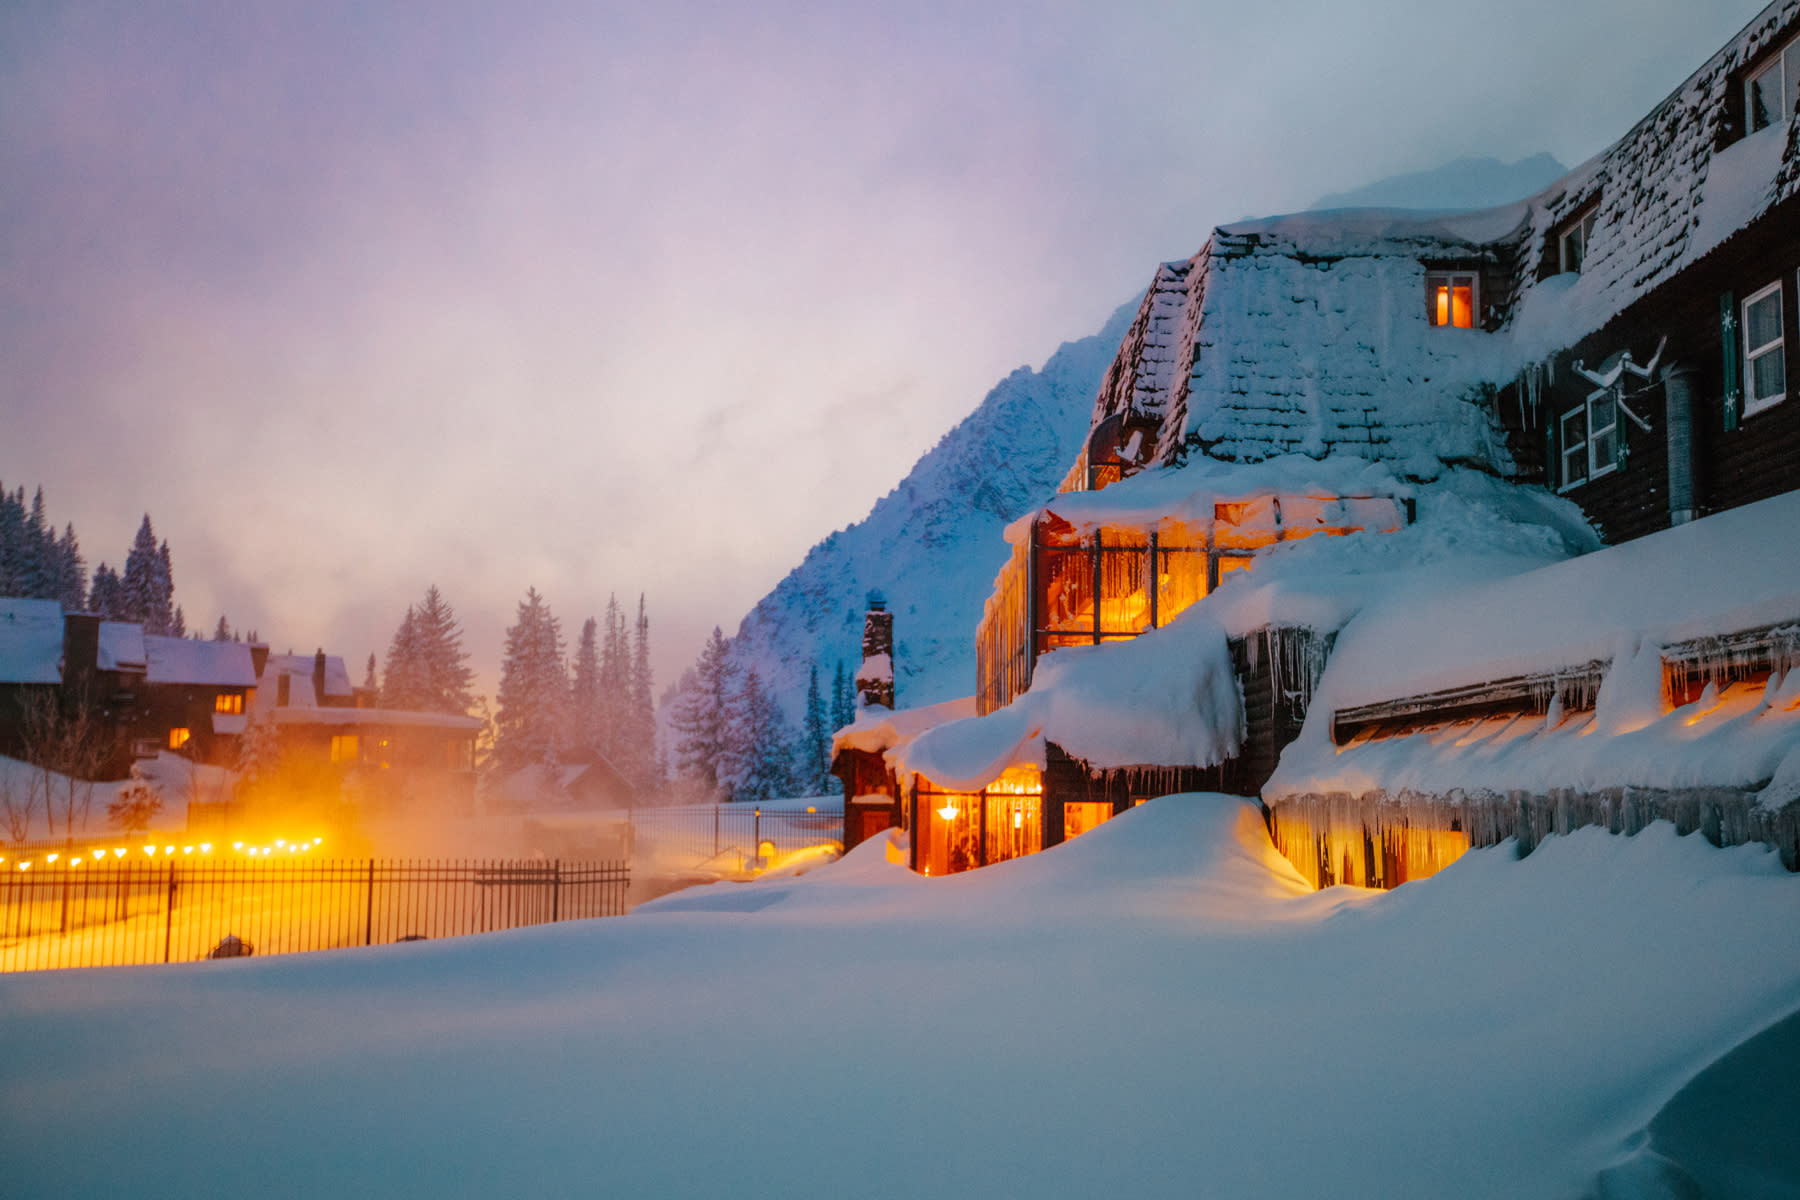 The Alta Peruvian Lodge at Sunset